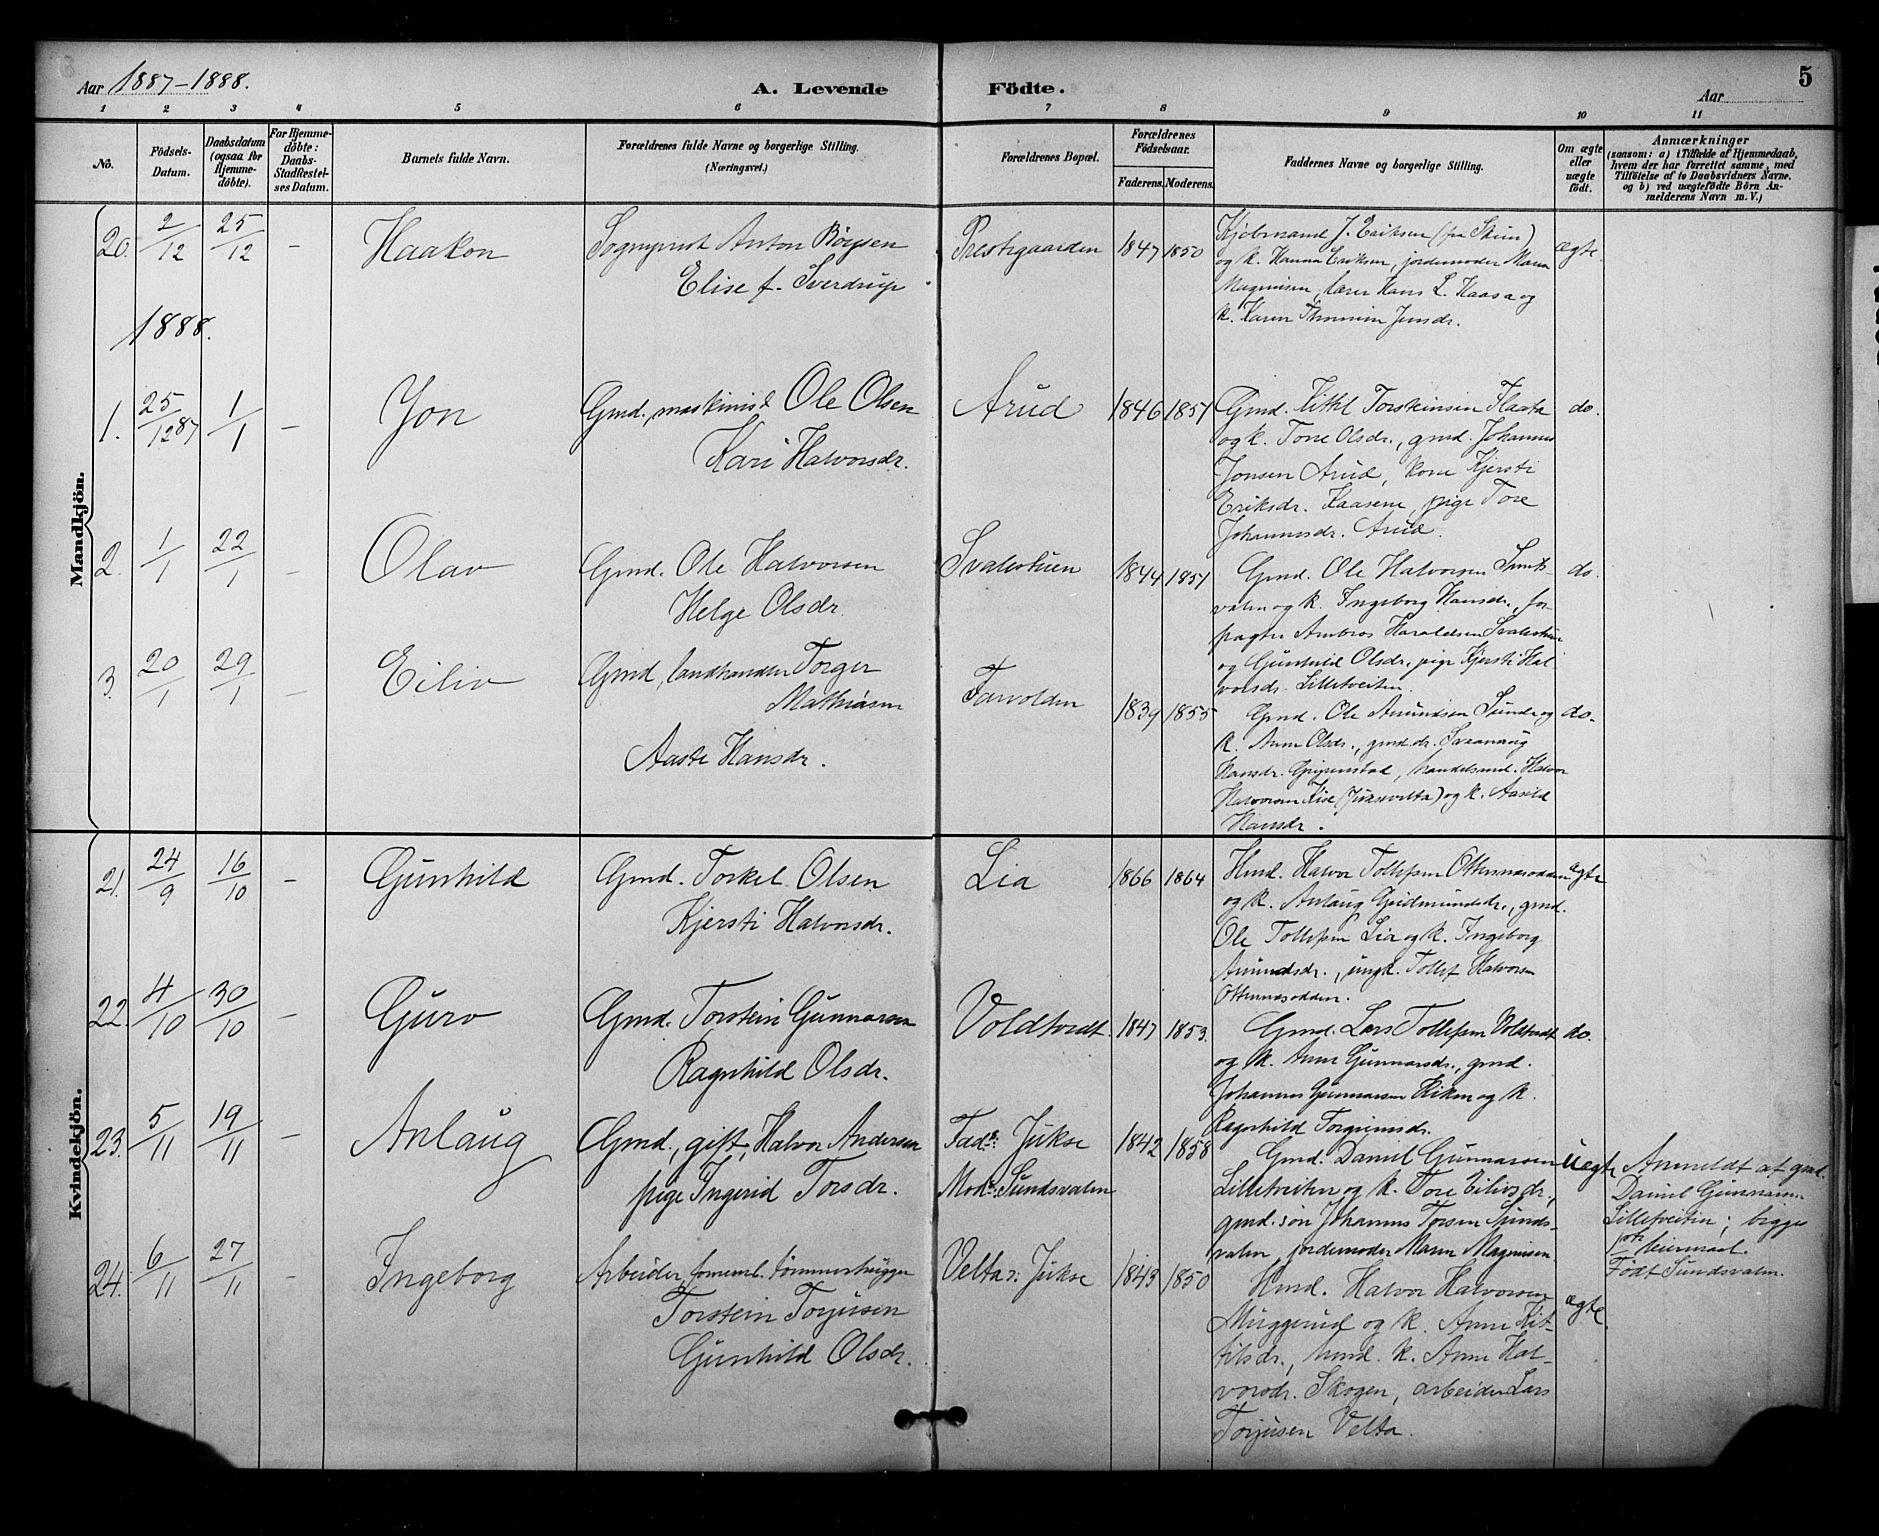 SAKO, Sauherad kirkebøker, F/Fa/L0009: Ministerialbok nr. I 9, 1887-1912, s. 5